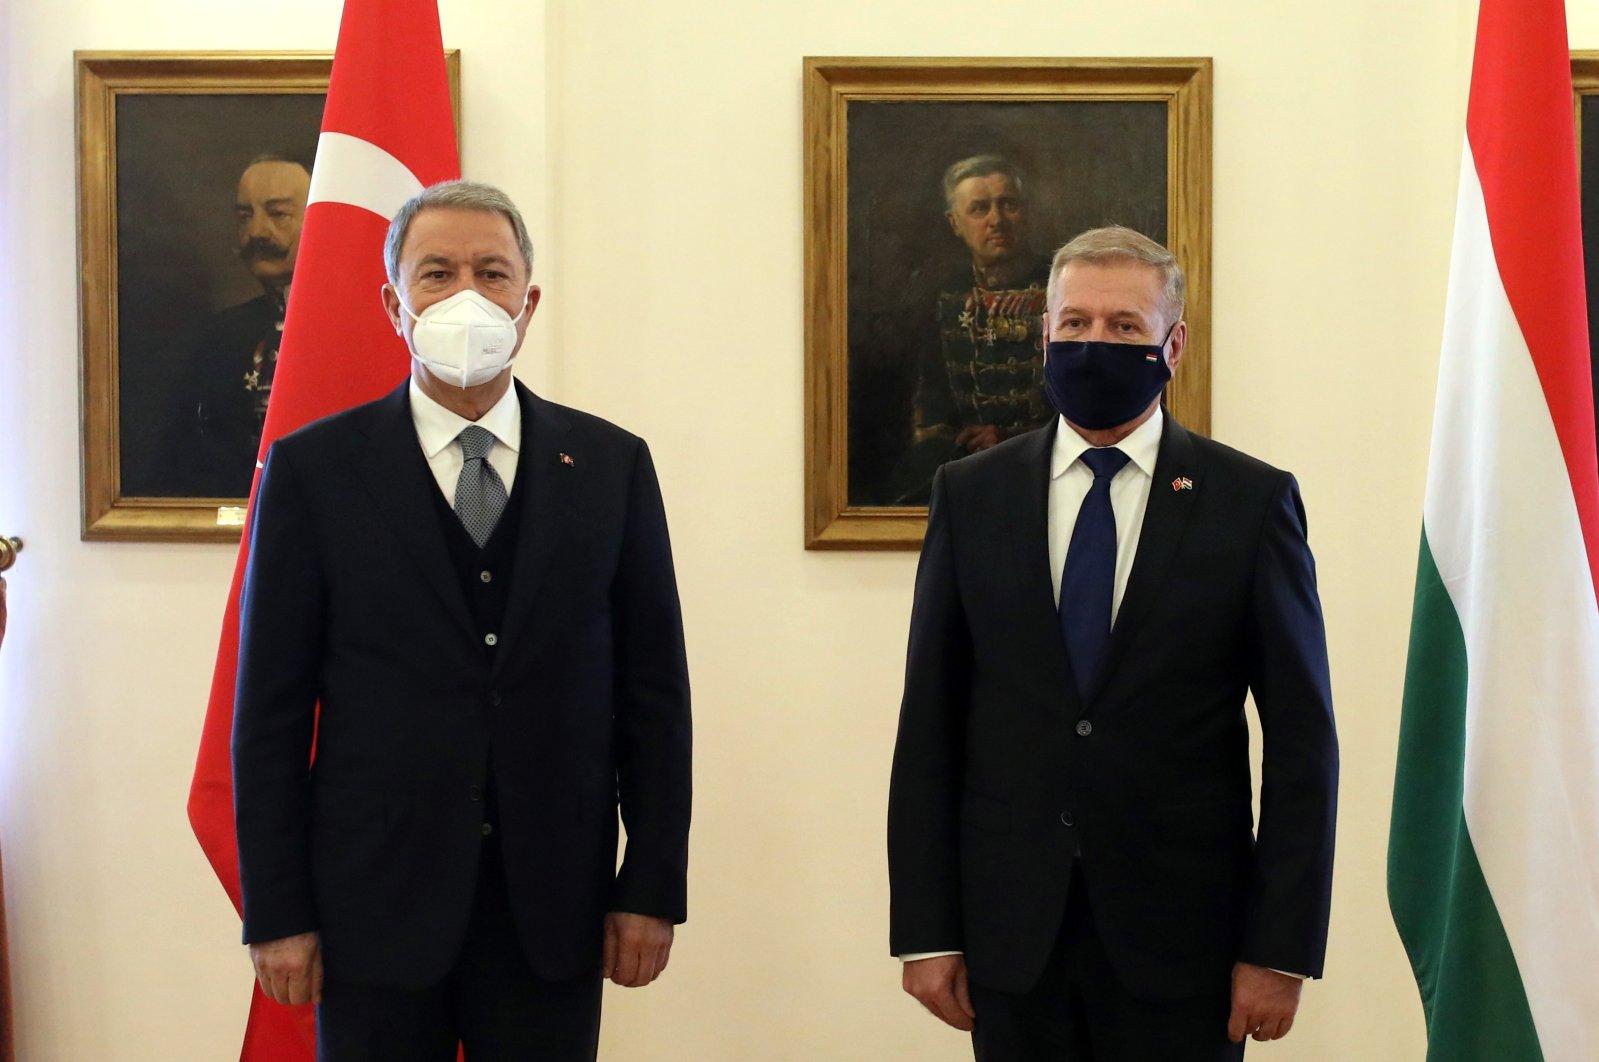 Defense Minister Hulusi Akar (L) and his Hungarian counterpart Tibor Menko meet in the capital Budapest, Hungary, Feb. 3, 2021. (AA Photo)